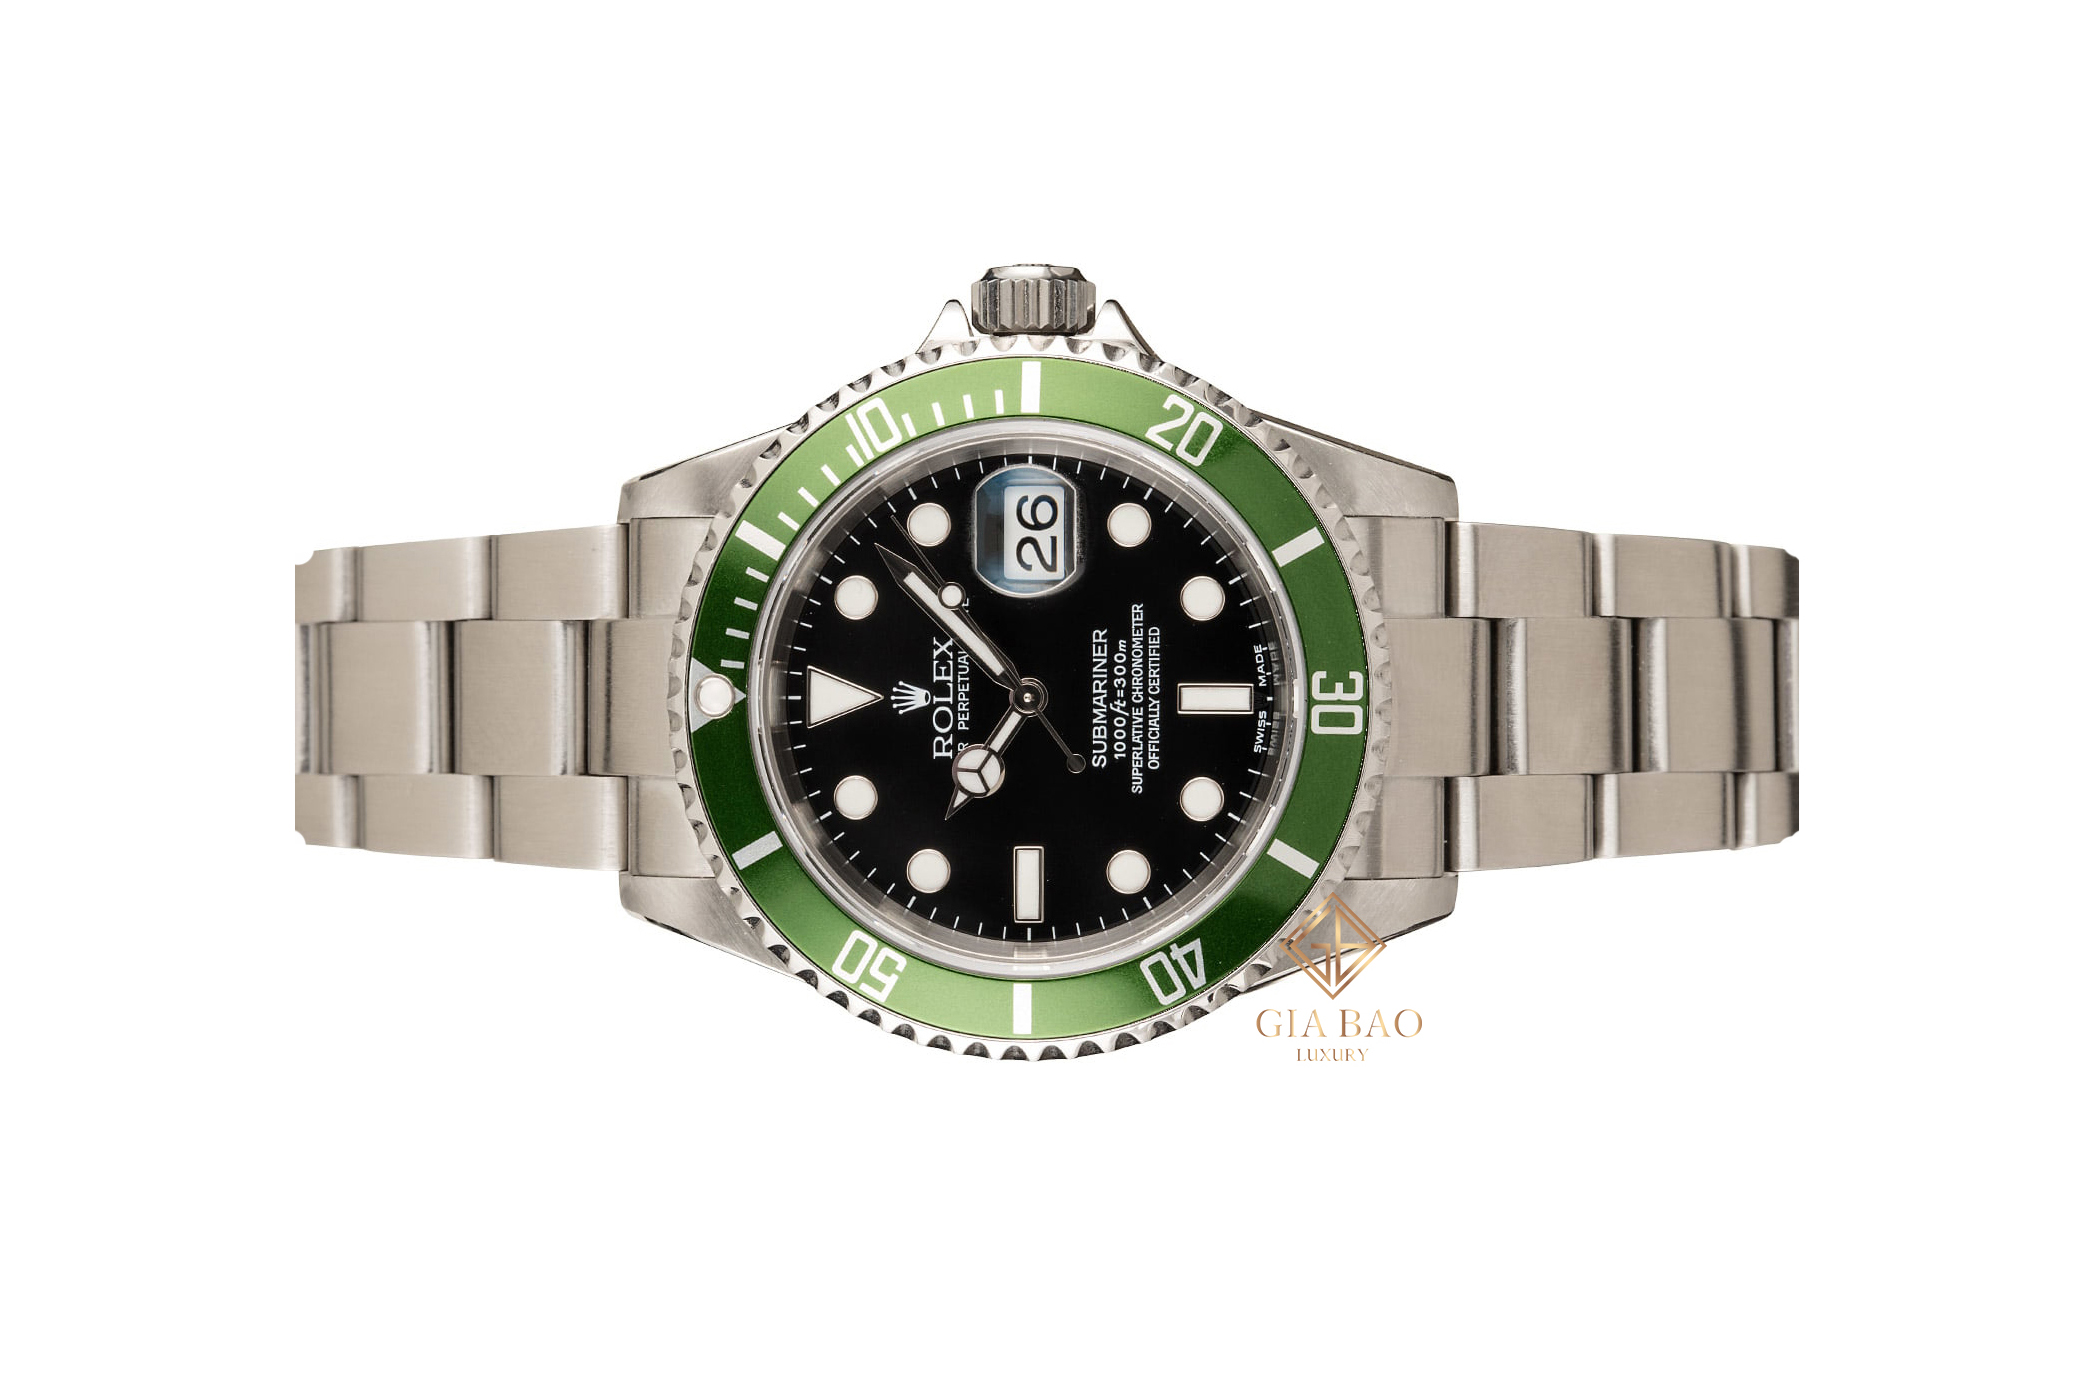 Đồng hồ Rolex Submariner 16610